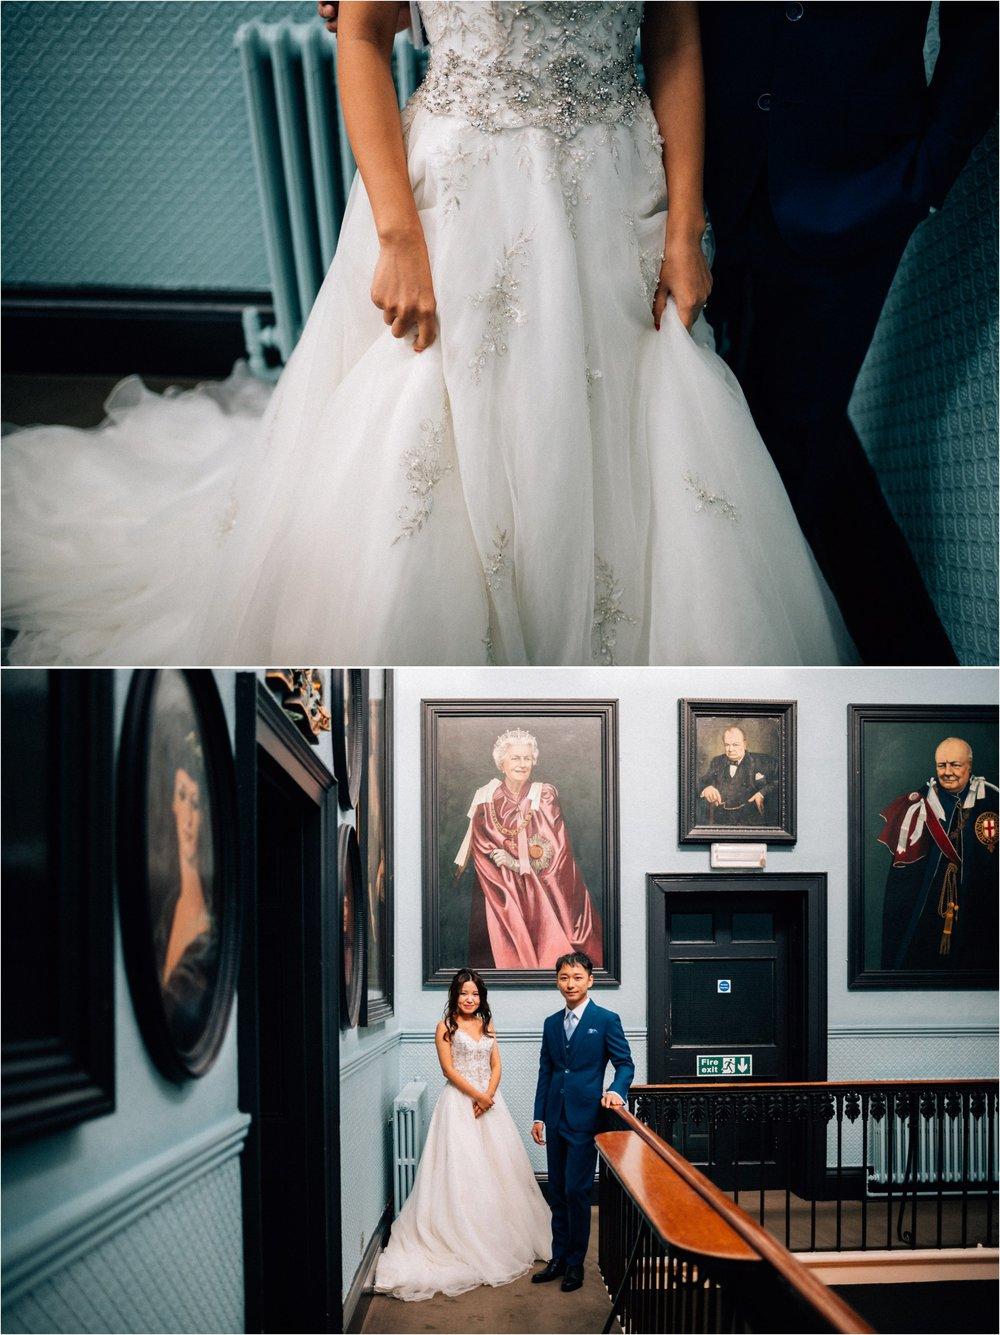 York city elopement wedding photographer_0013.jpg